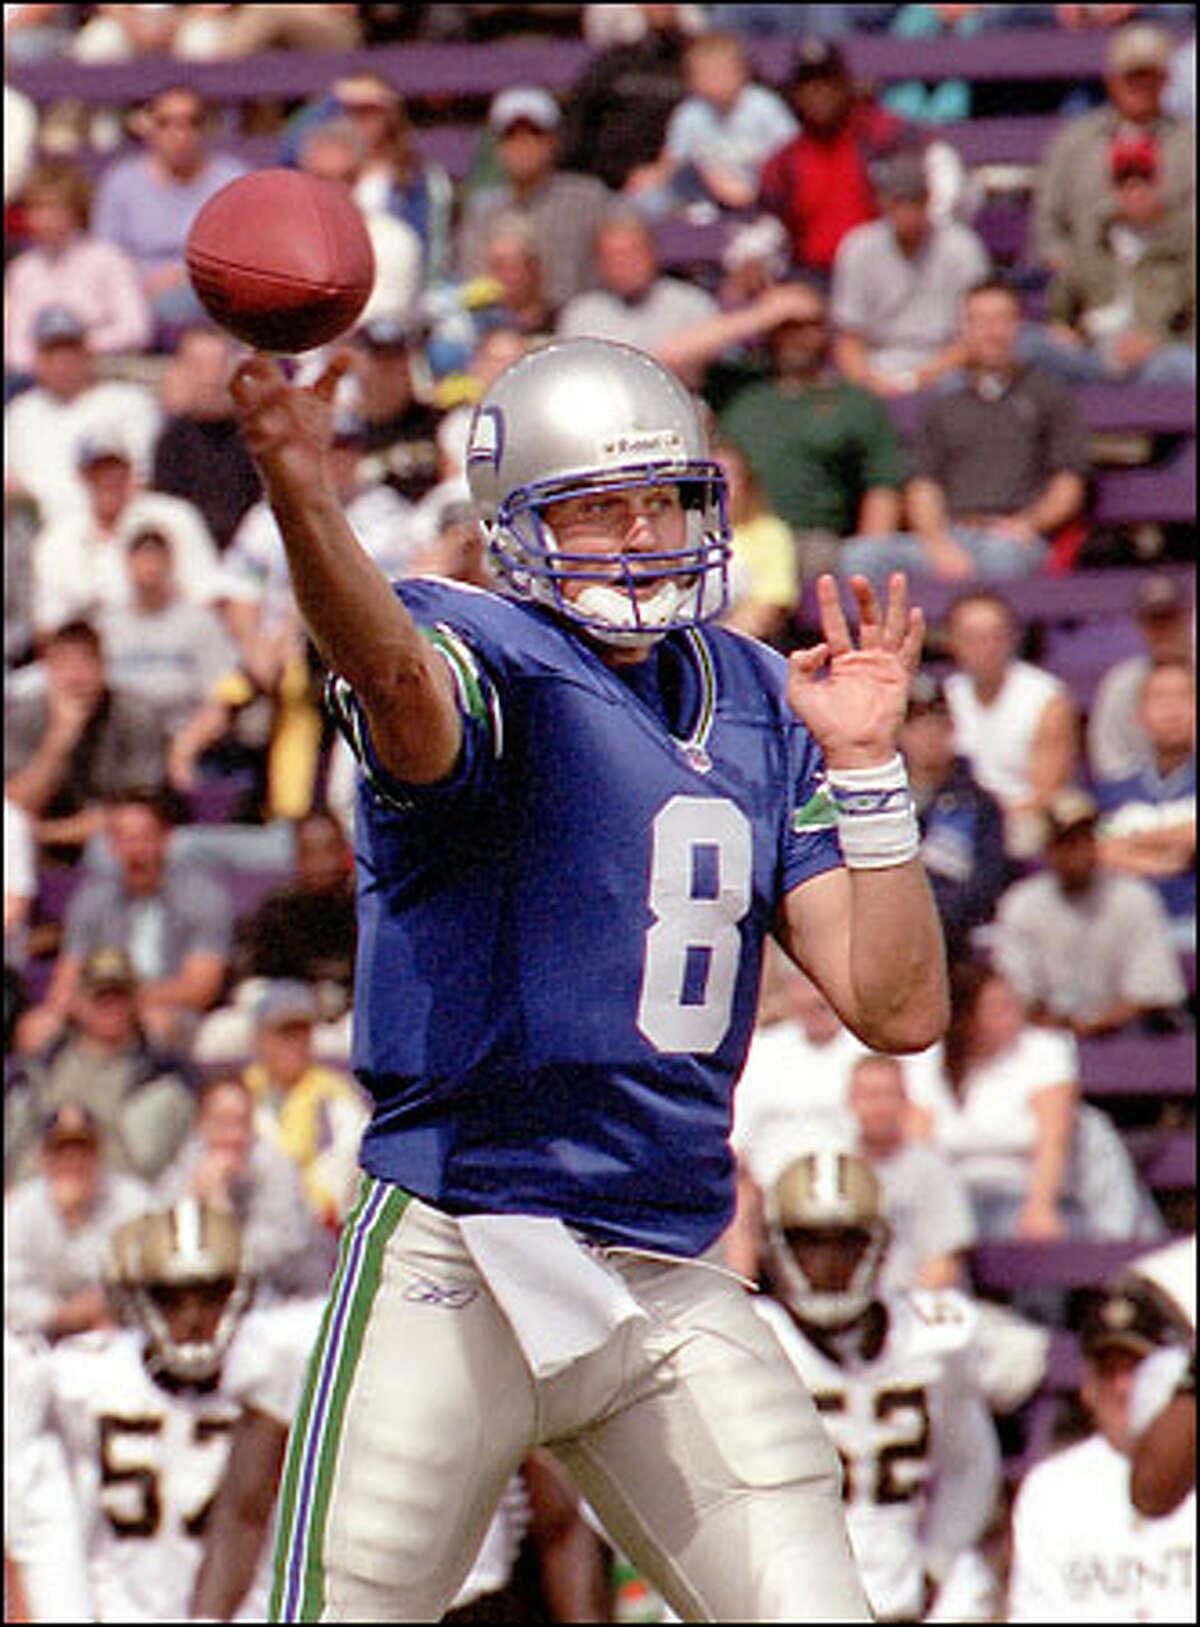 Seahawks quarterback Matt Hasselbeck sends a pass to Karsten Bailey for a touchdown in the first quarter.